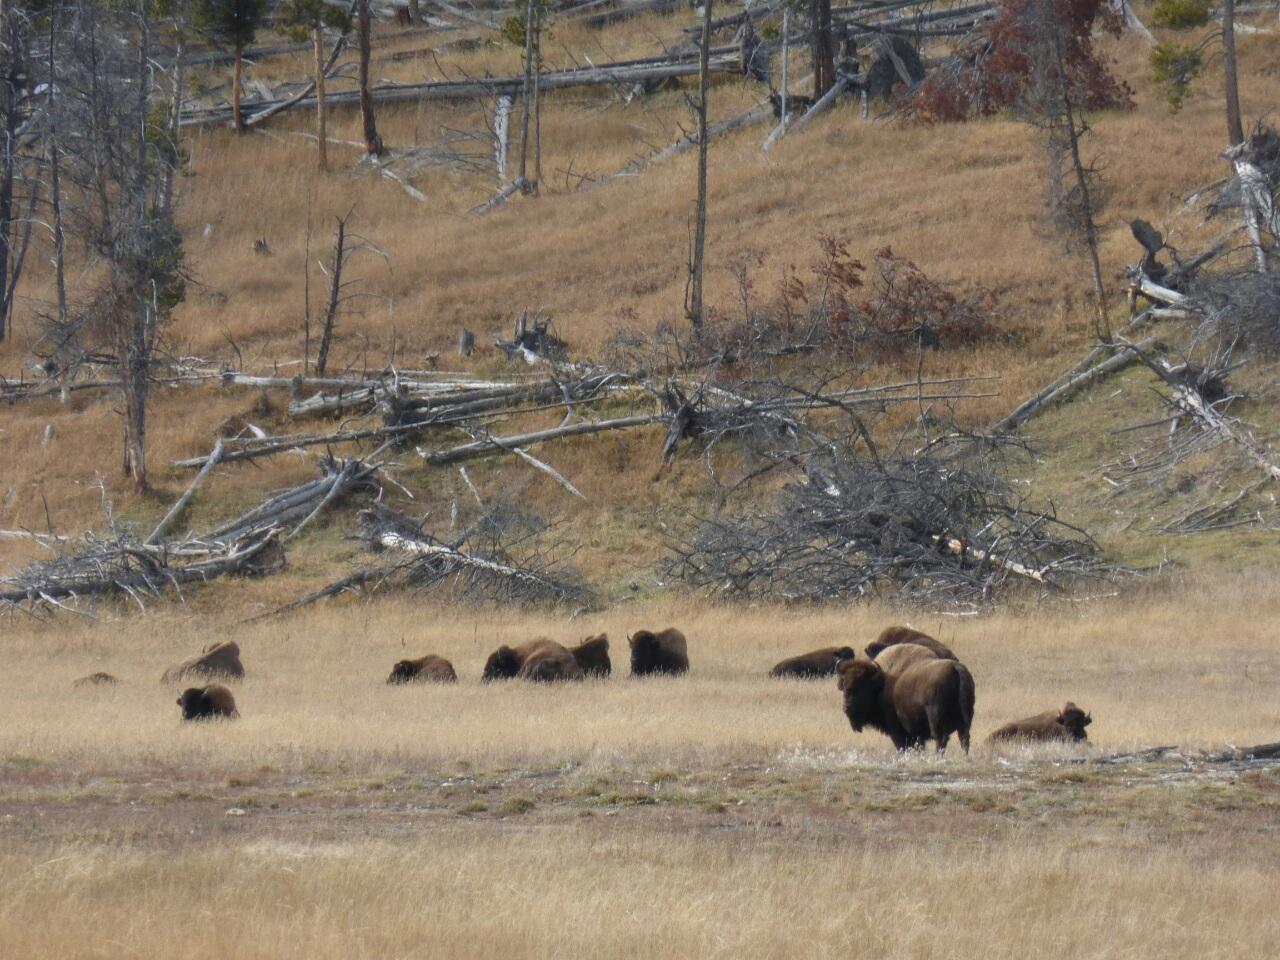 More of Yellowstone's inhabitants